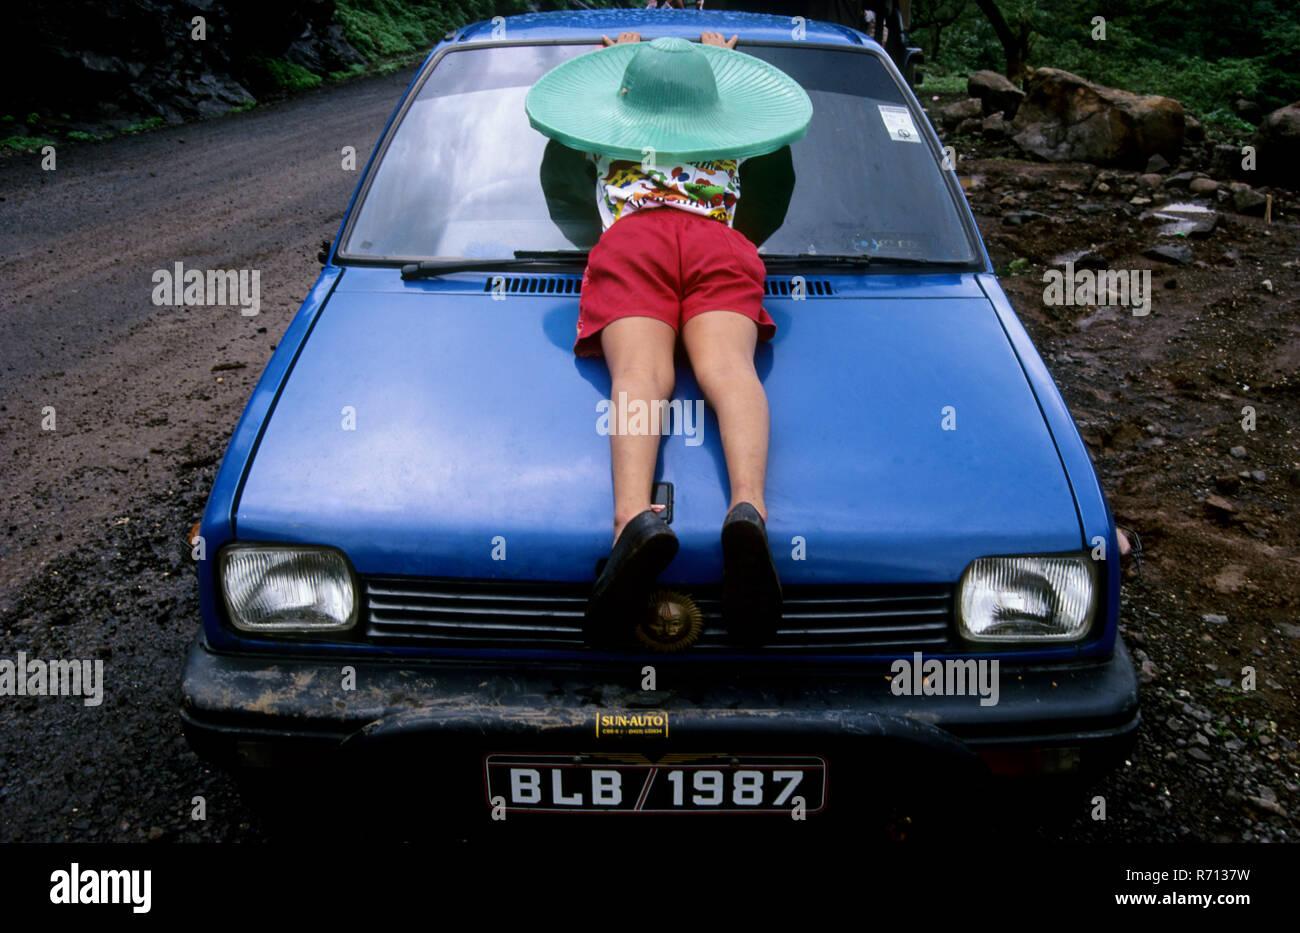 a rare angle view of boy sleeping on bonnet of maruti car - Stock Image